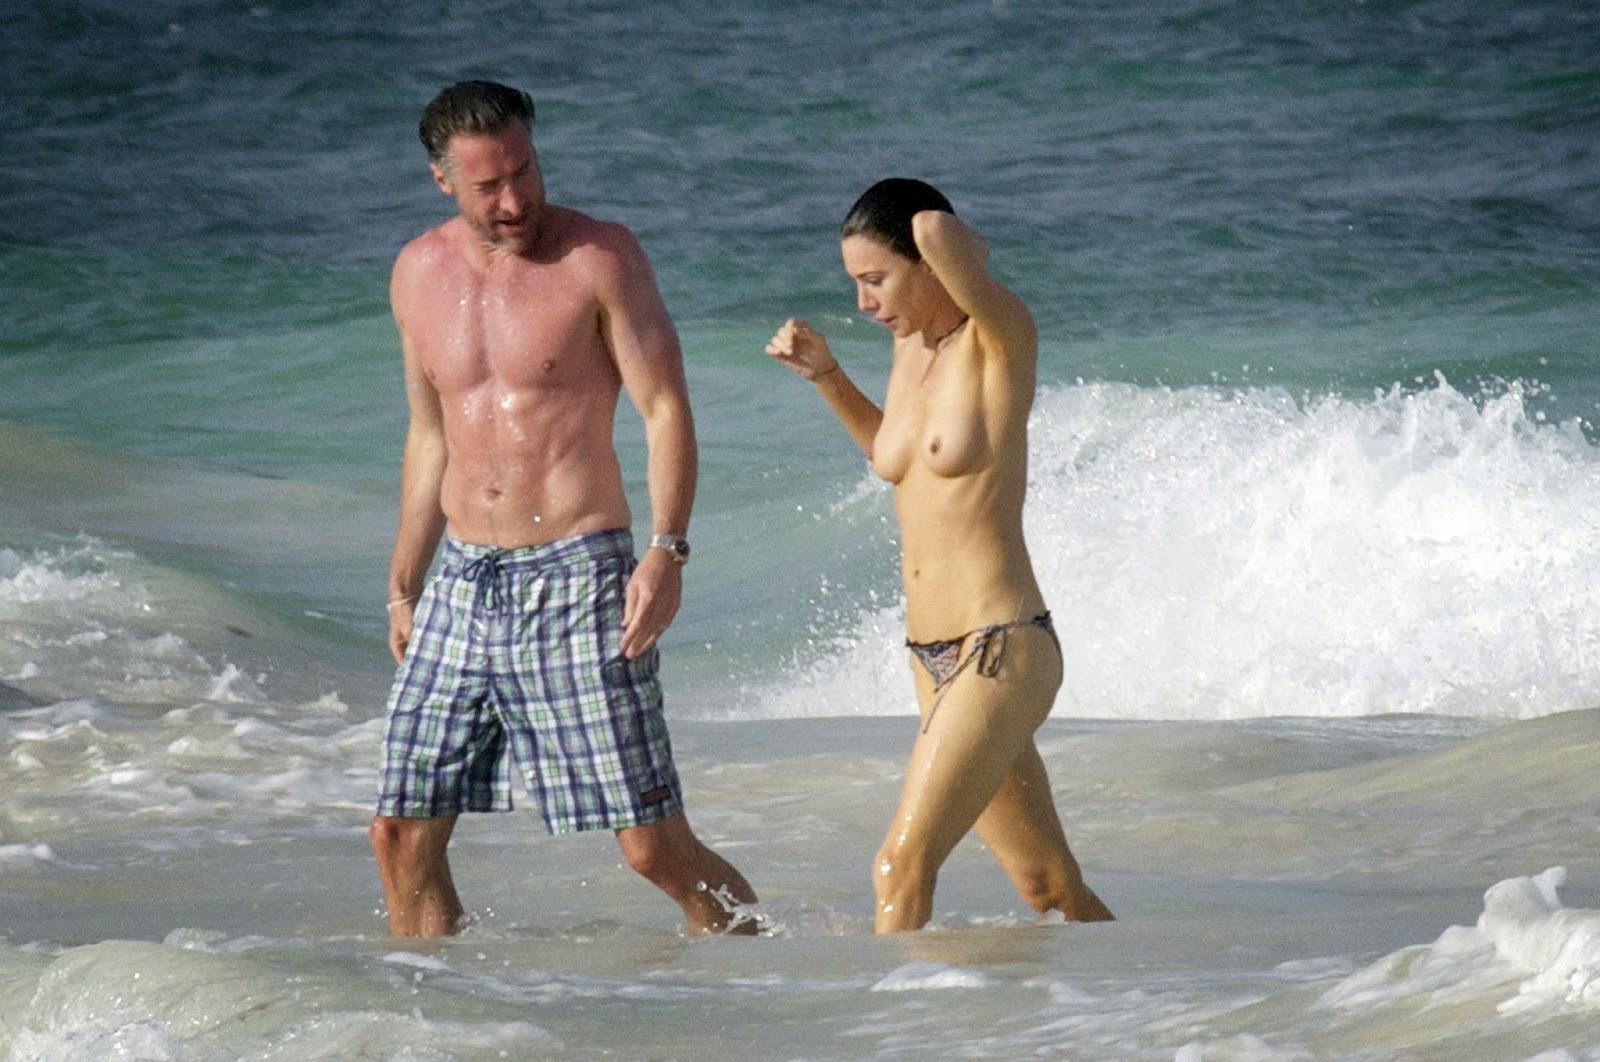 Love jaime murray bikini attractively Women